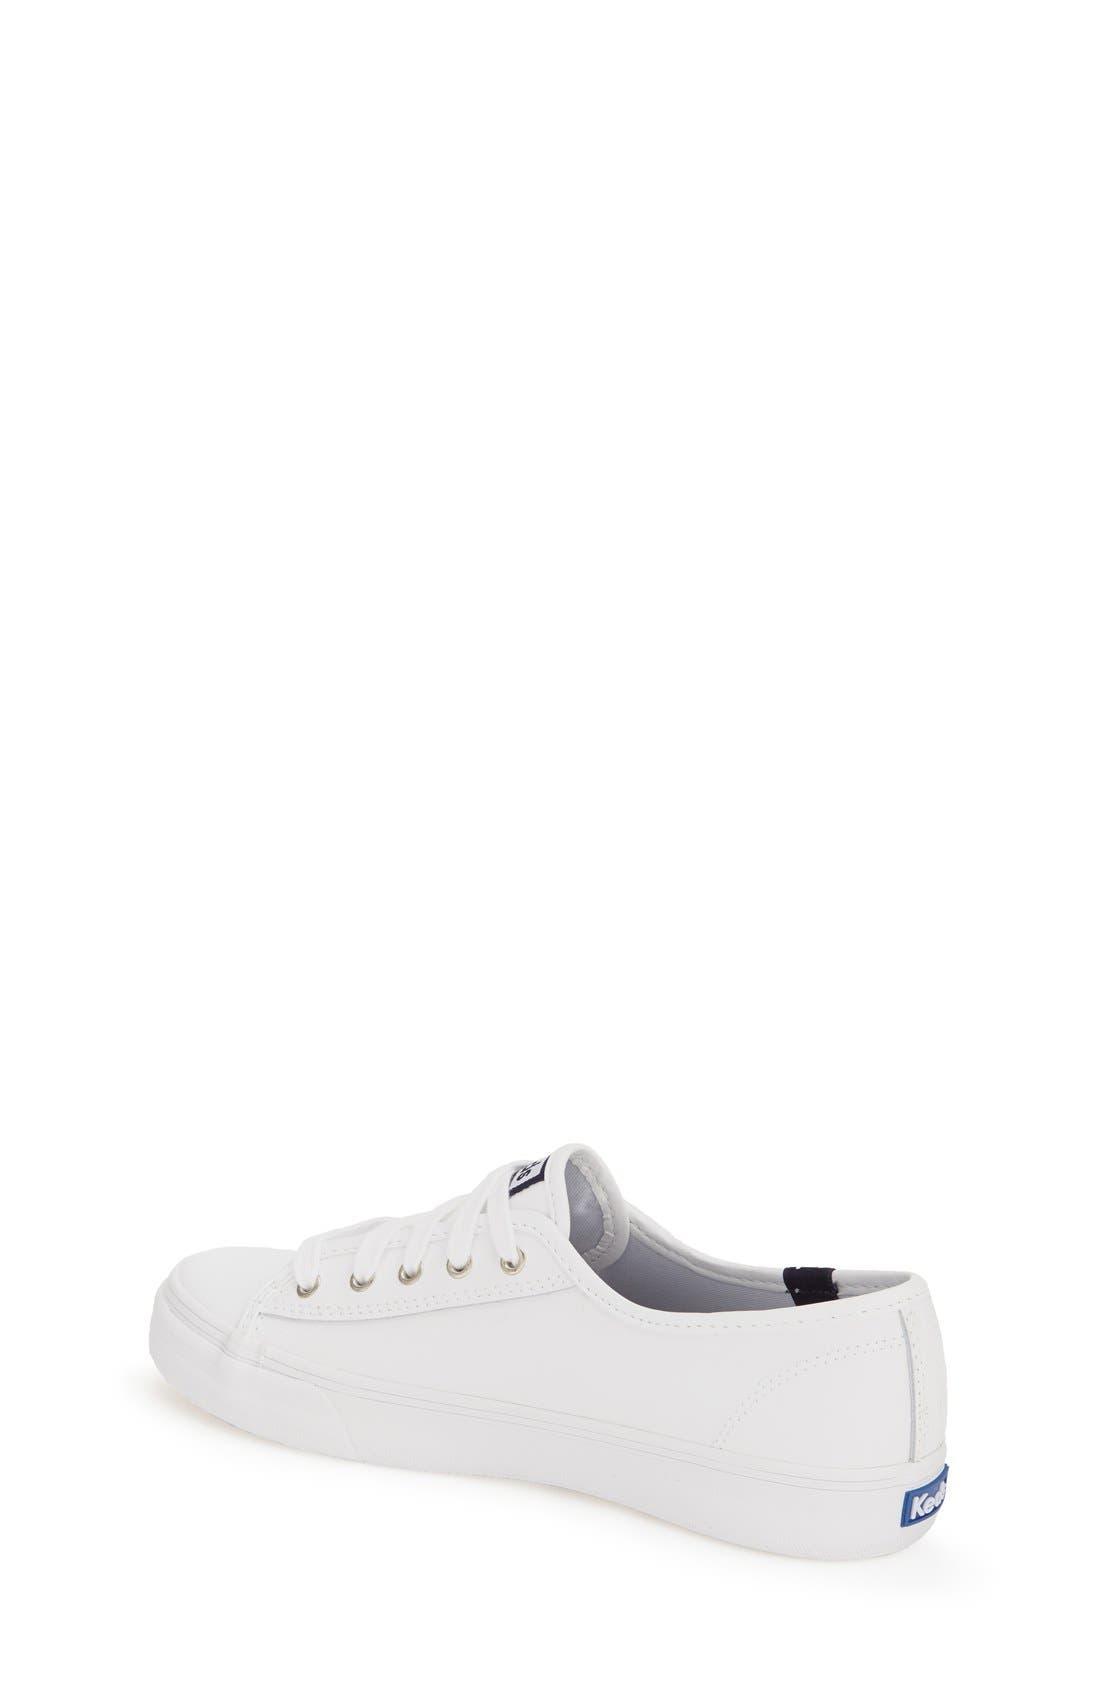 'Double Up' Sneaker,                             Alternate thumbnail 2, color,                             White